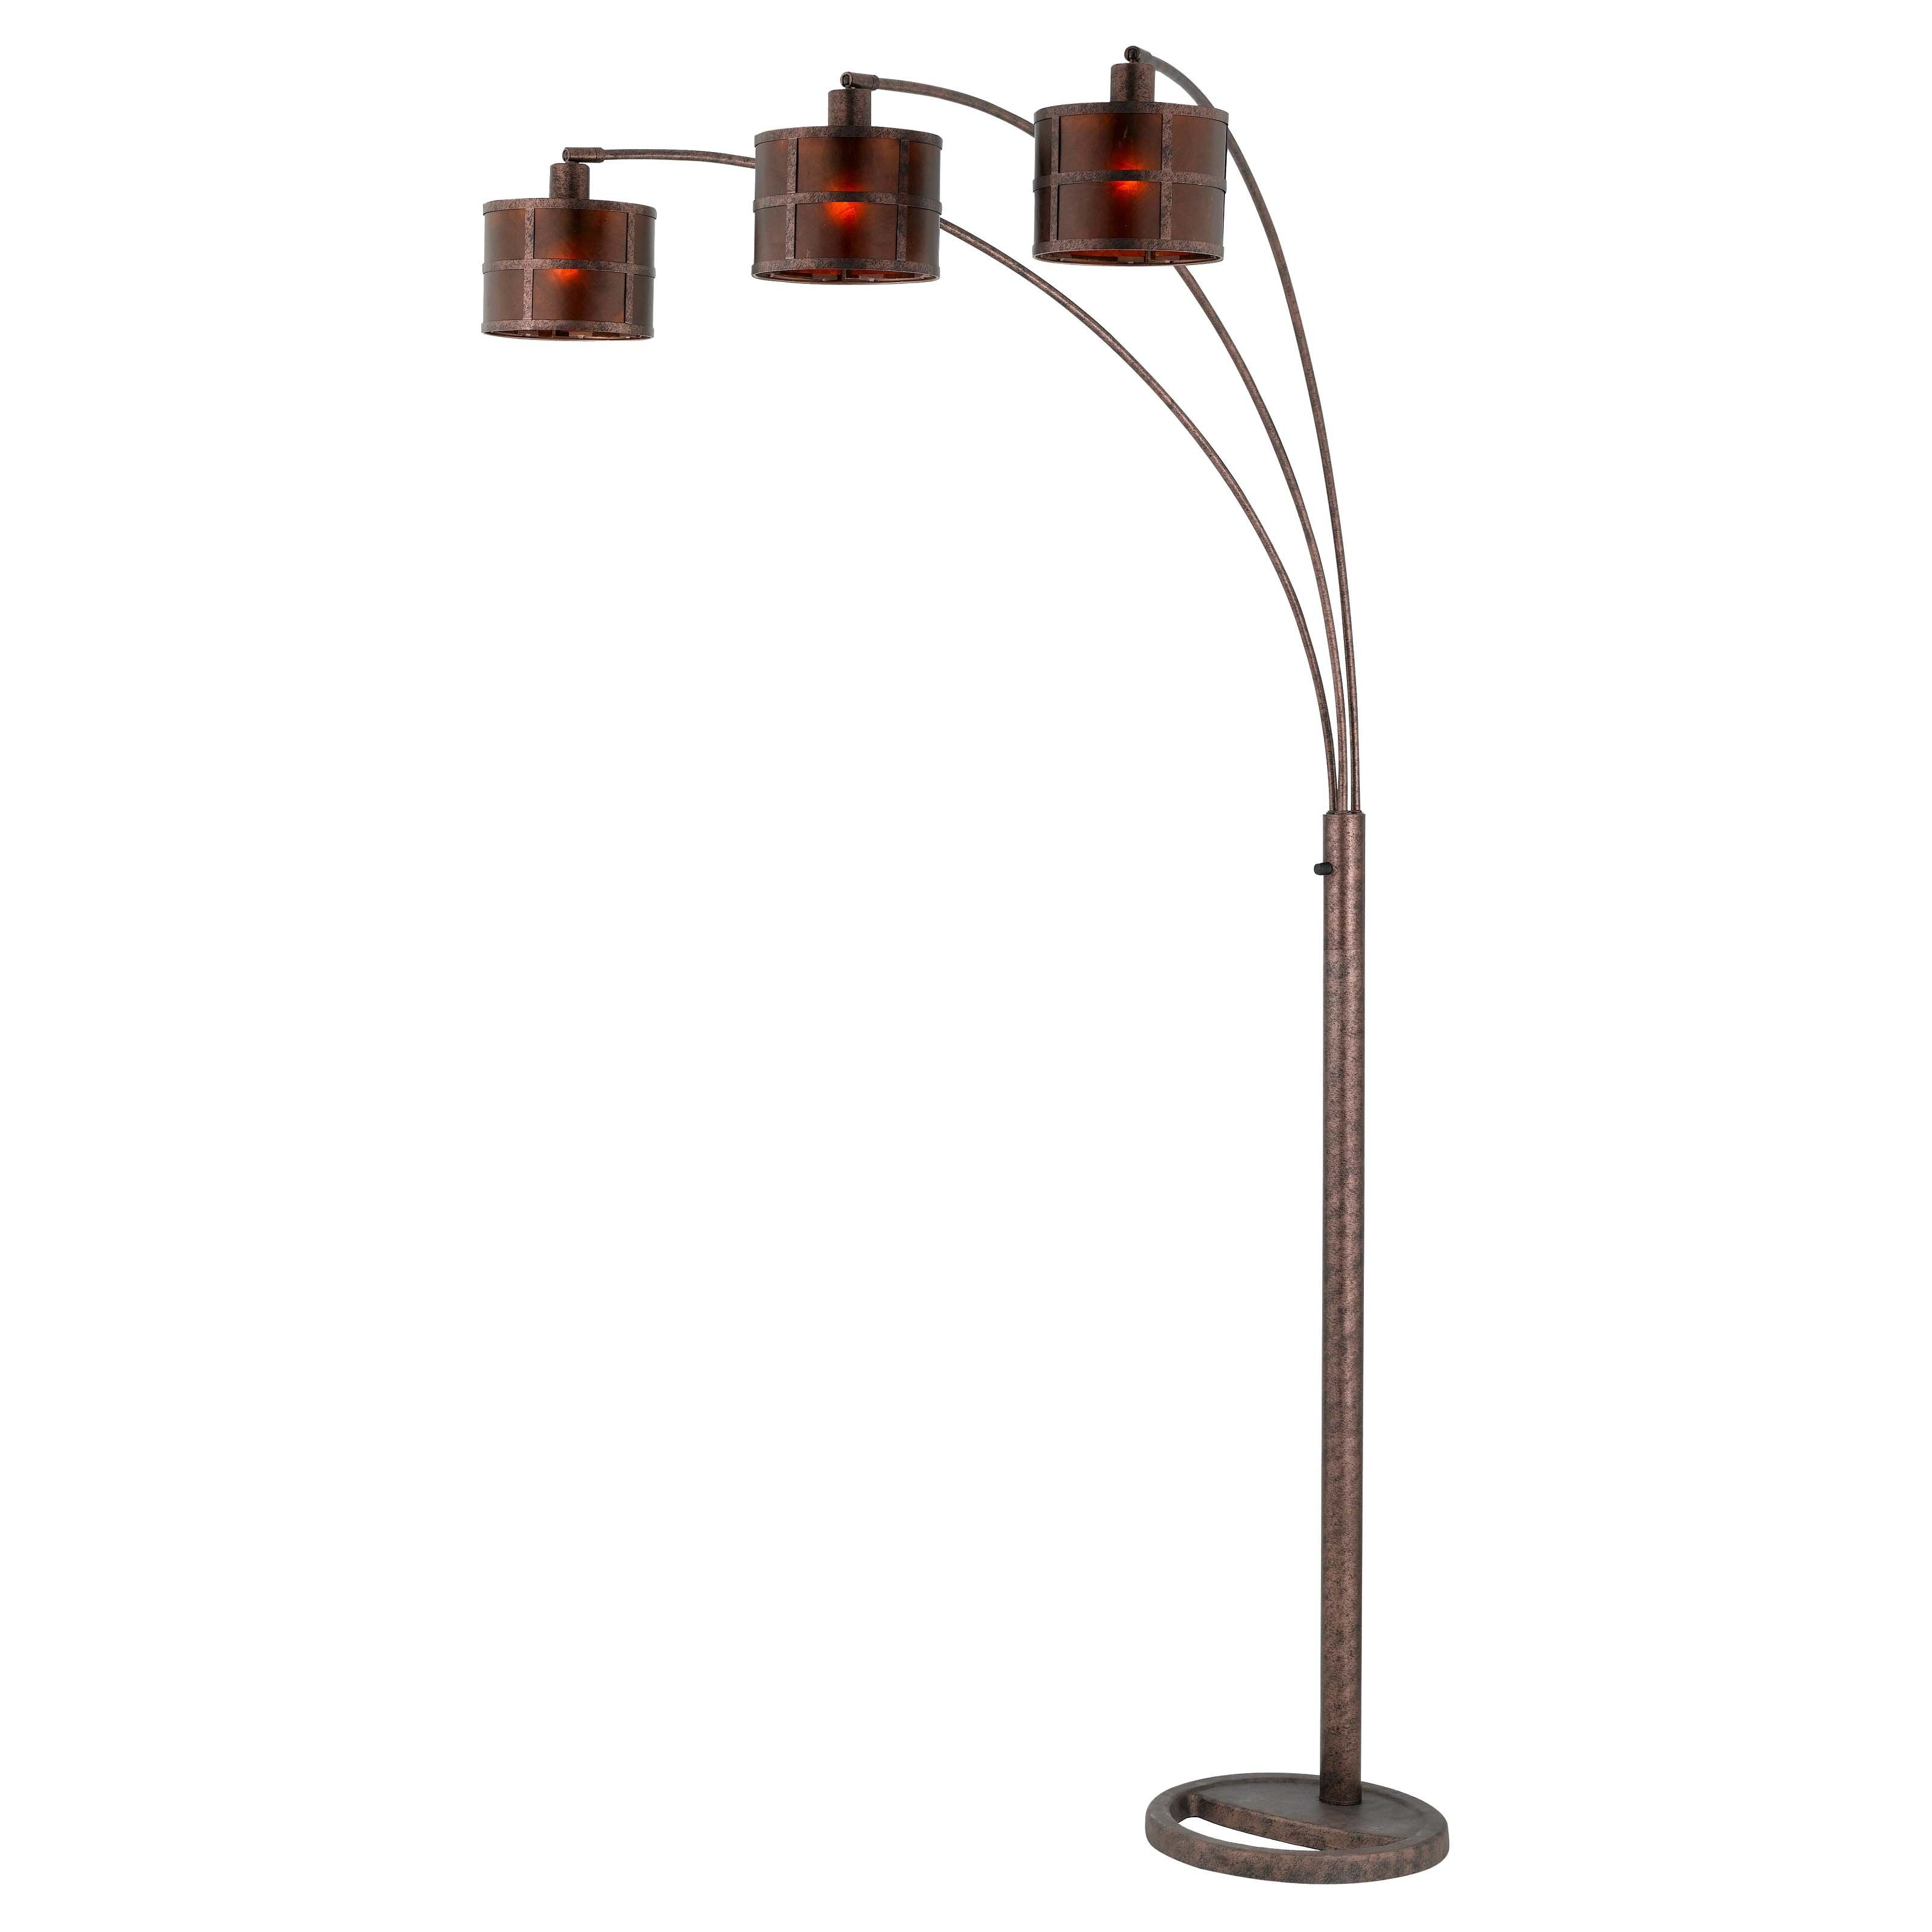 Cal Lighting Bo Mica Arc Metal Floor Lamp With 3 Way